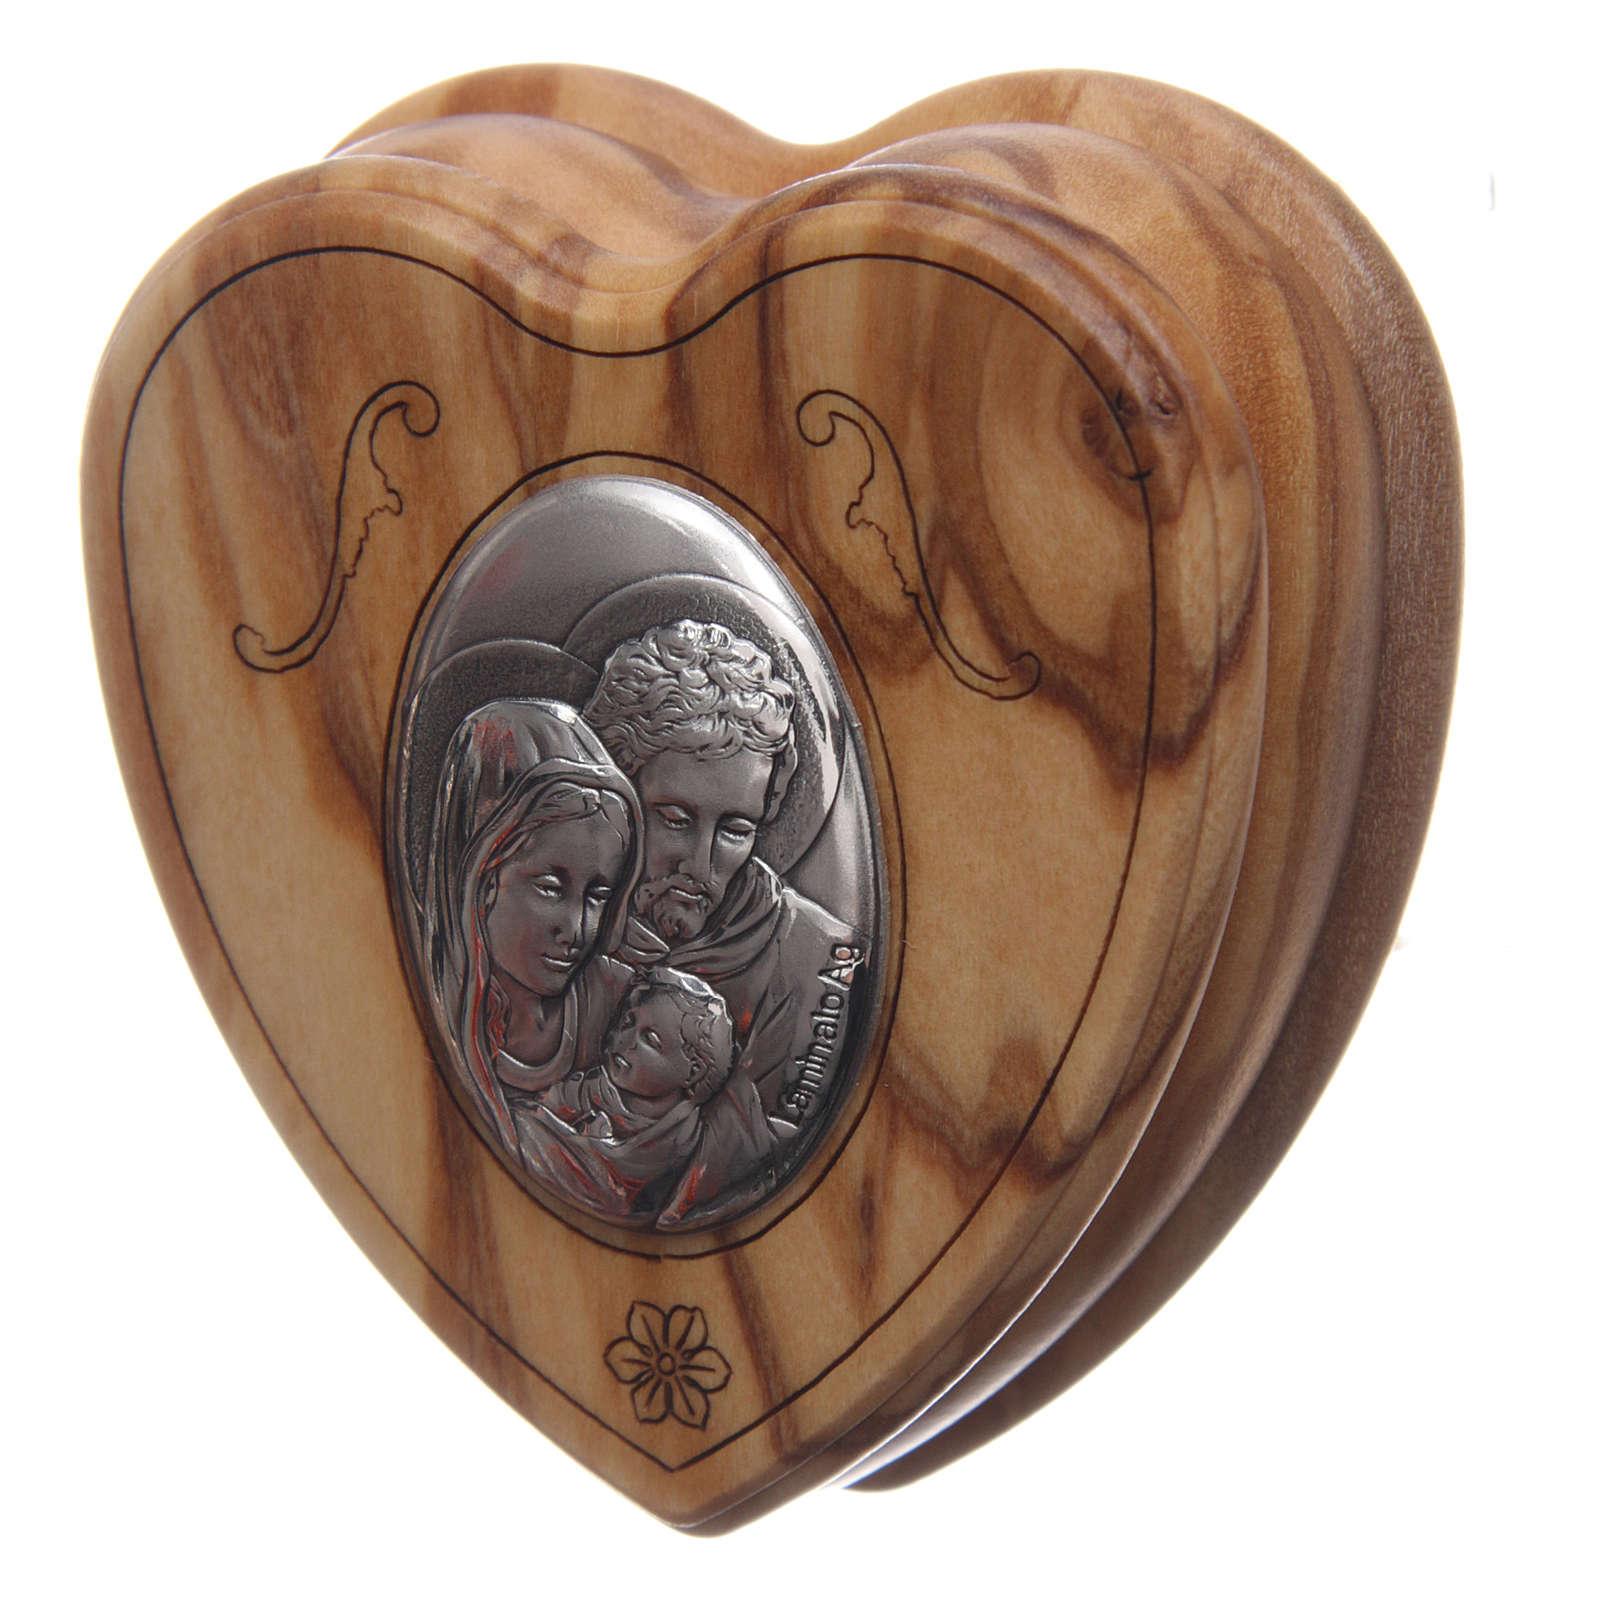 Coffret coeur en olivier avec chapelet en bois 5 mm 4